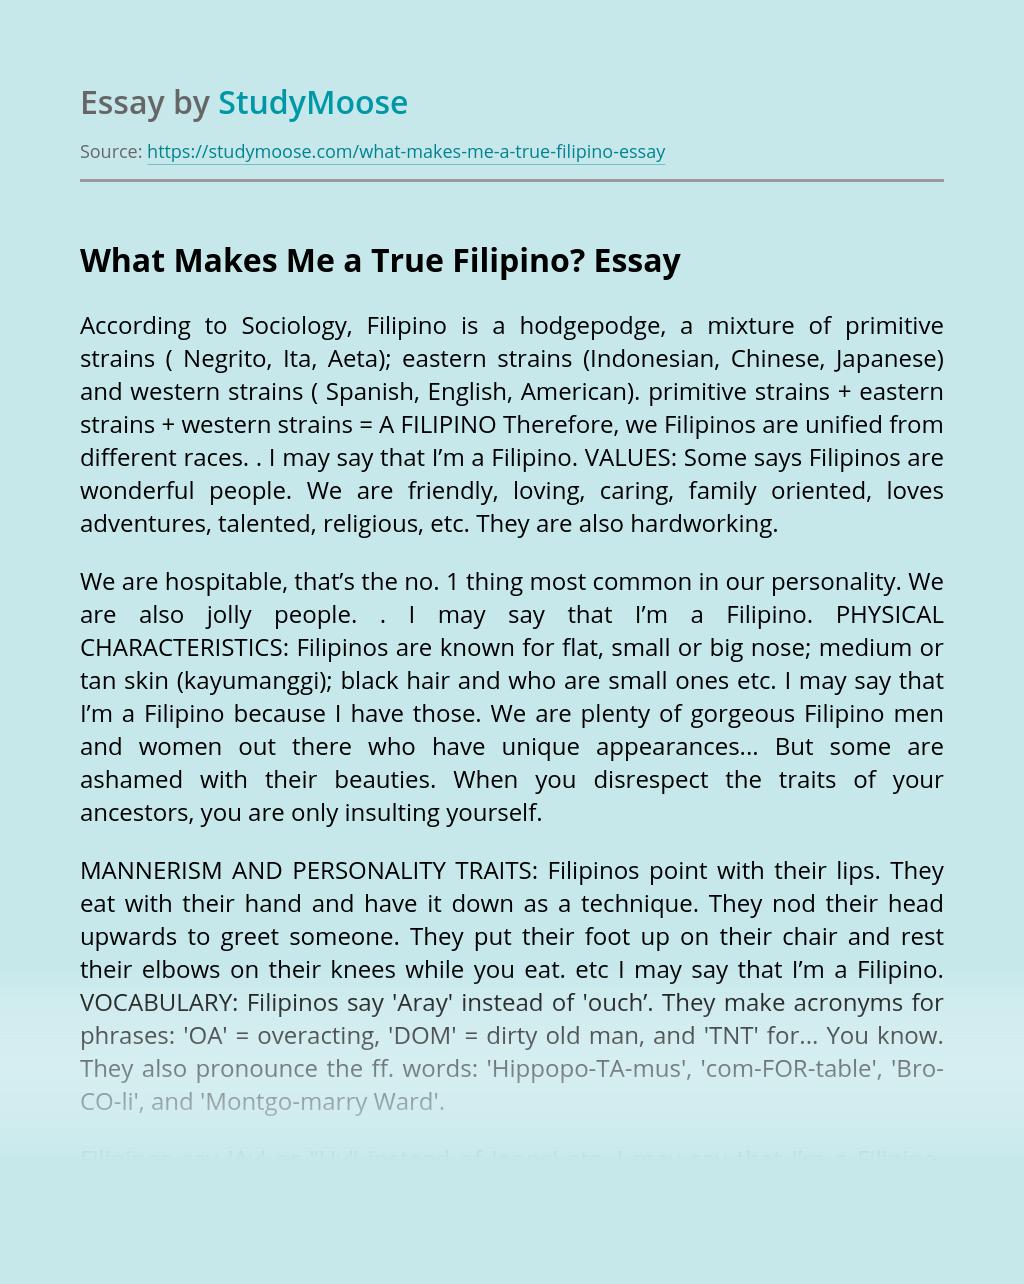 What Makes Me a True Filipino?